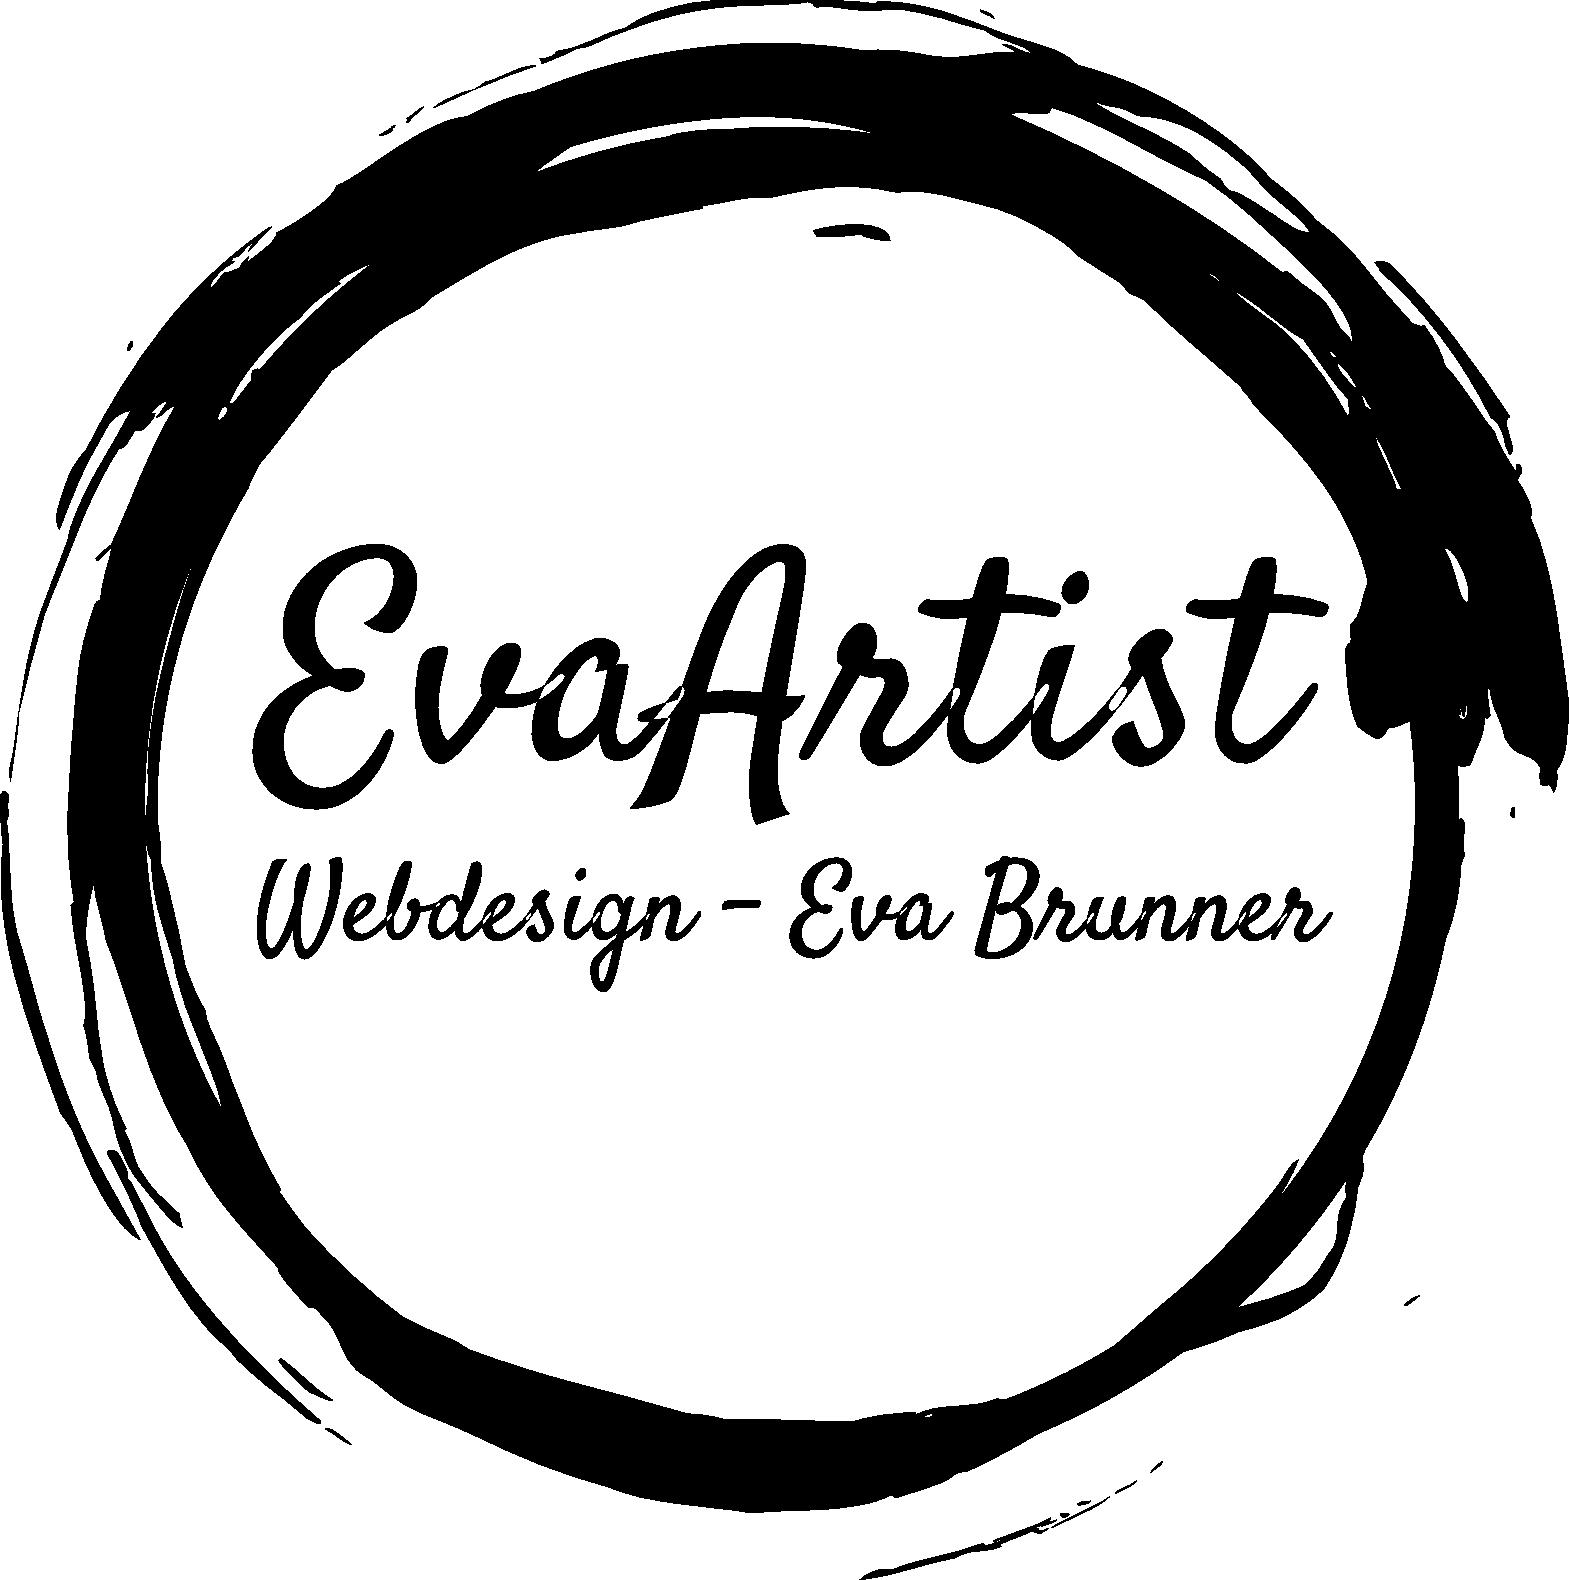 EvaArtist Webdesign